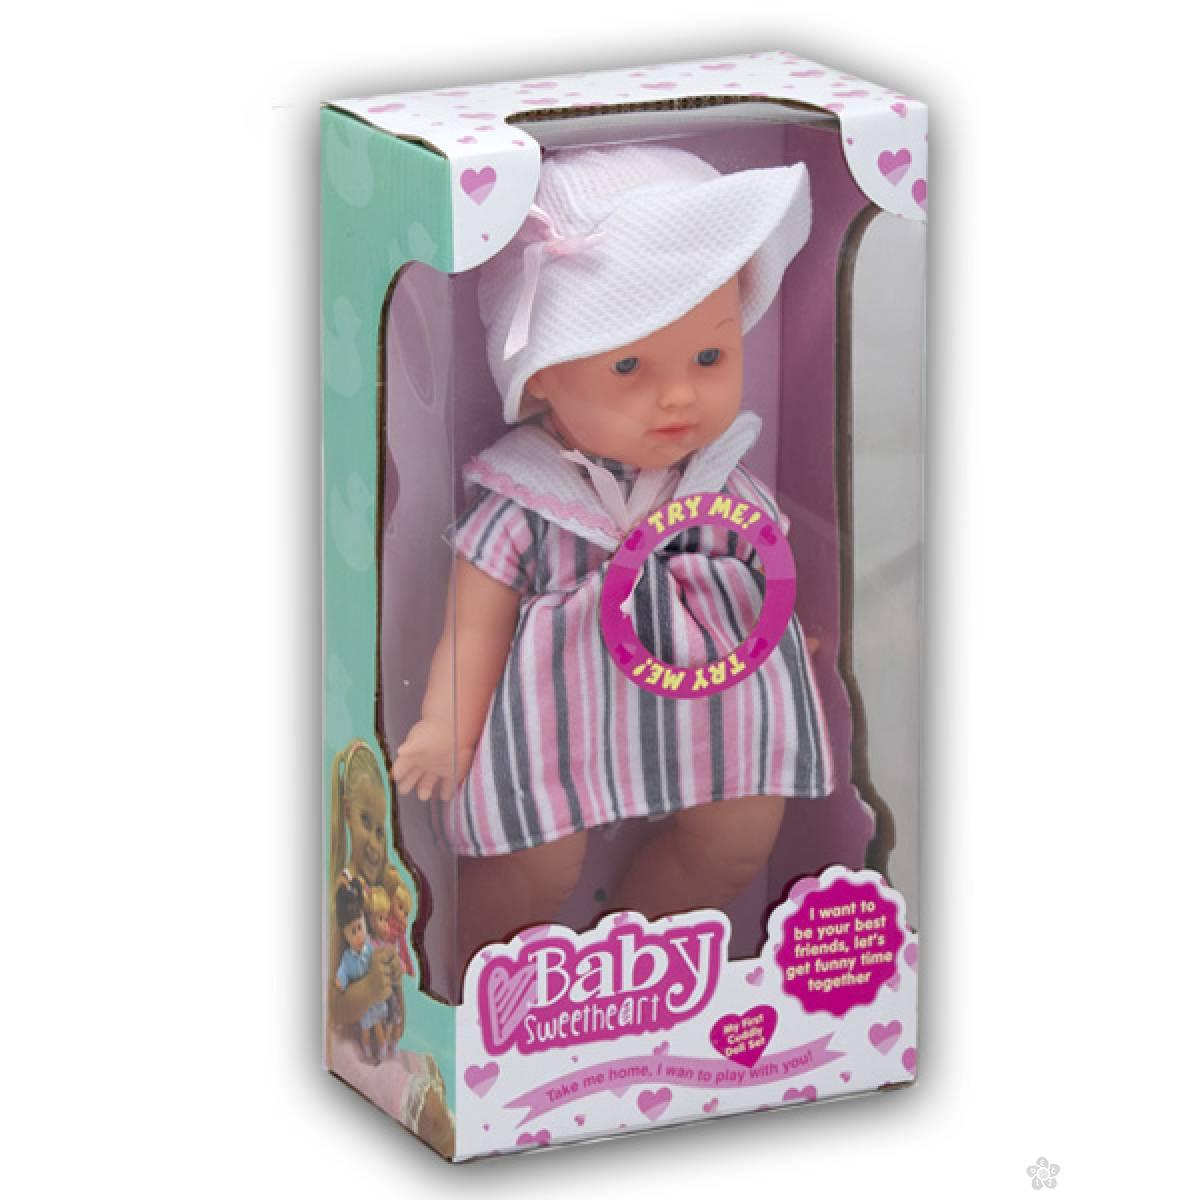 Lutka Sweetheart u šetnji 23257